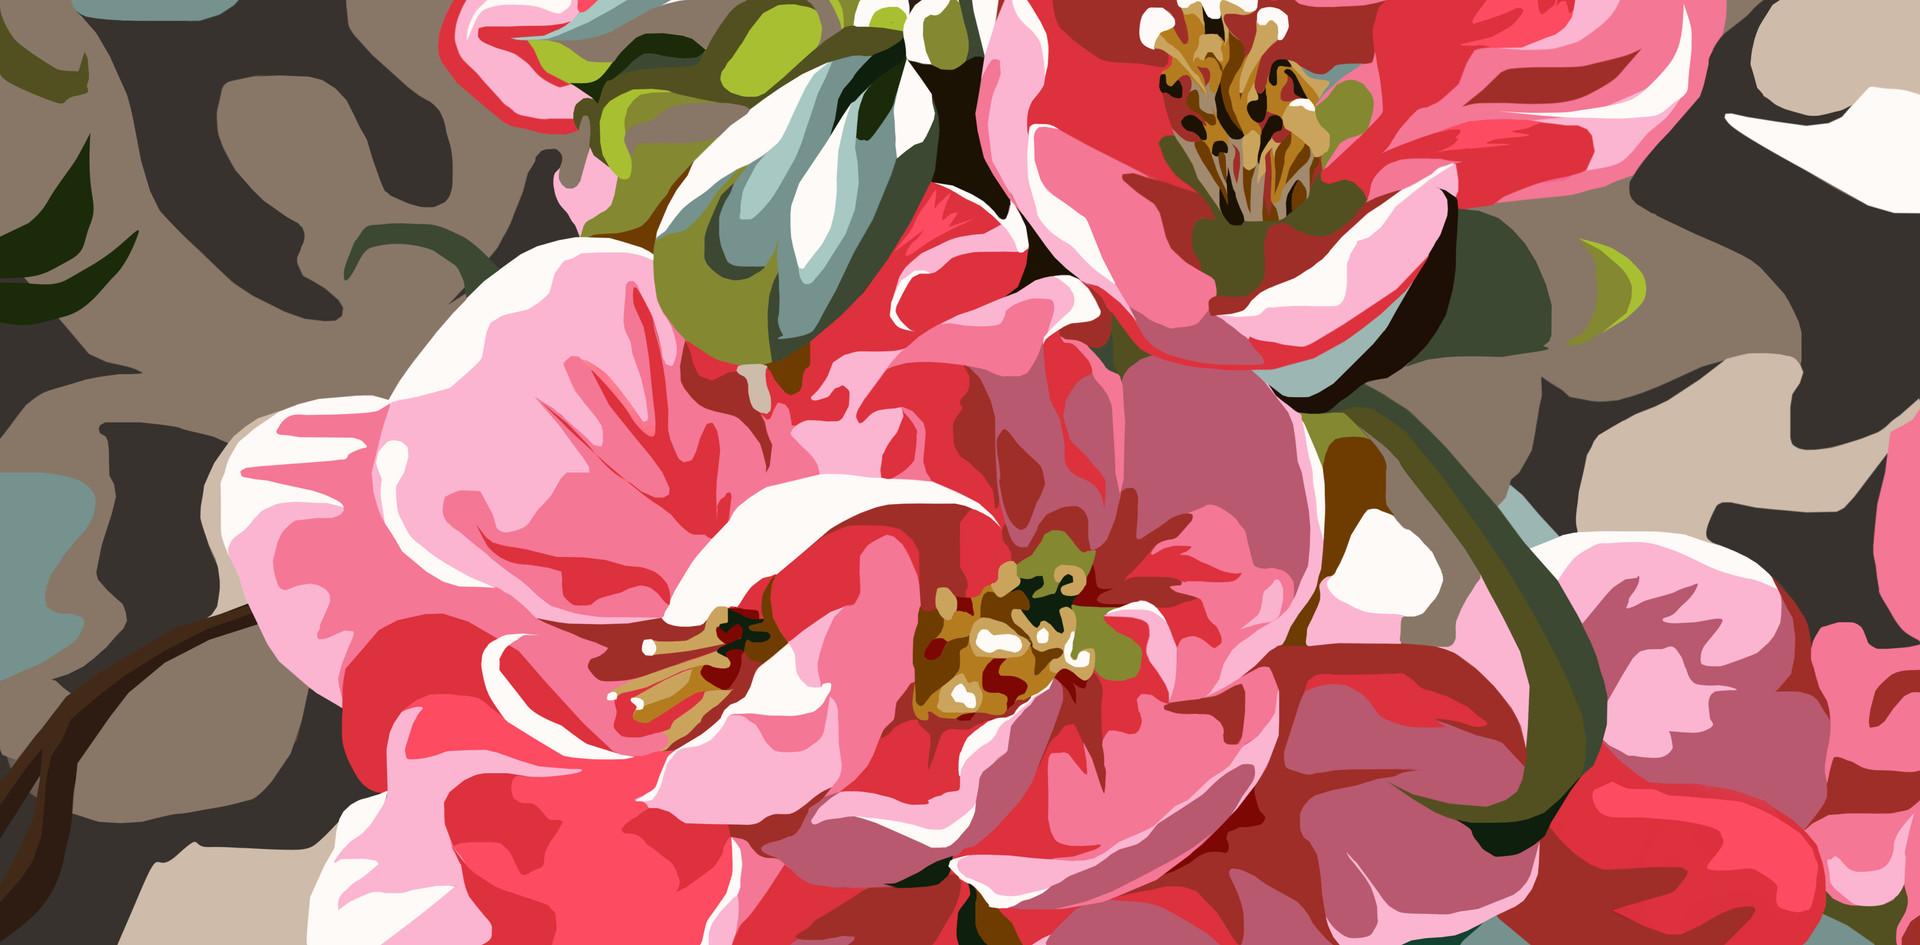 Cherry Blossom Digital Art.jpg